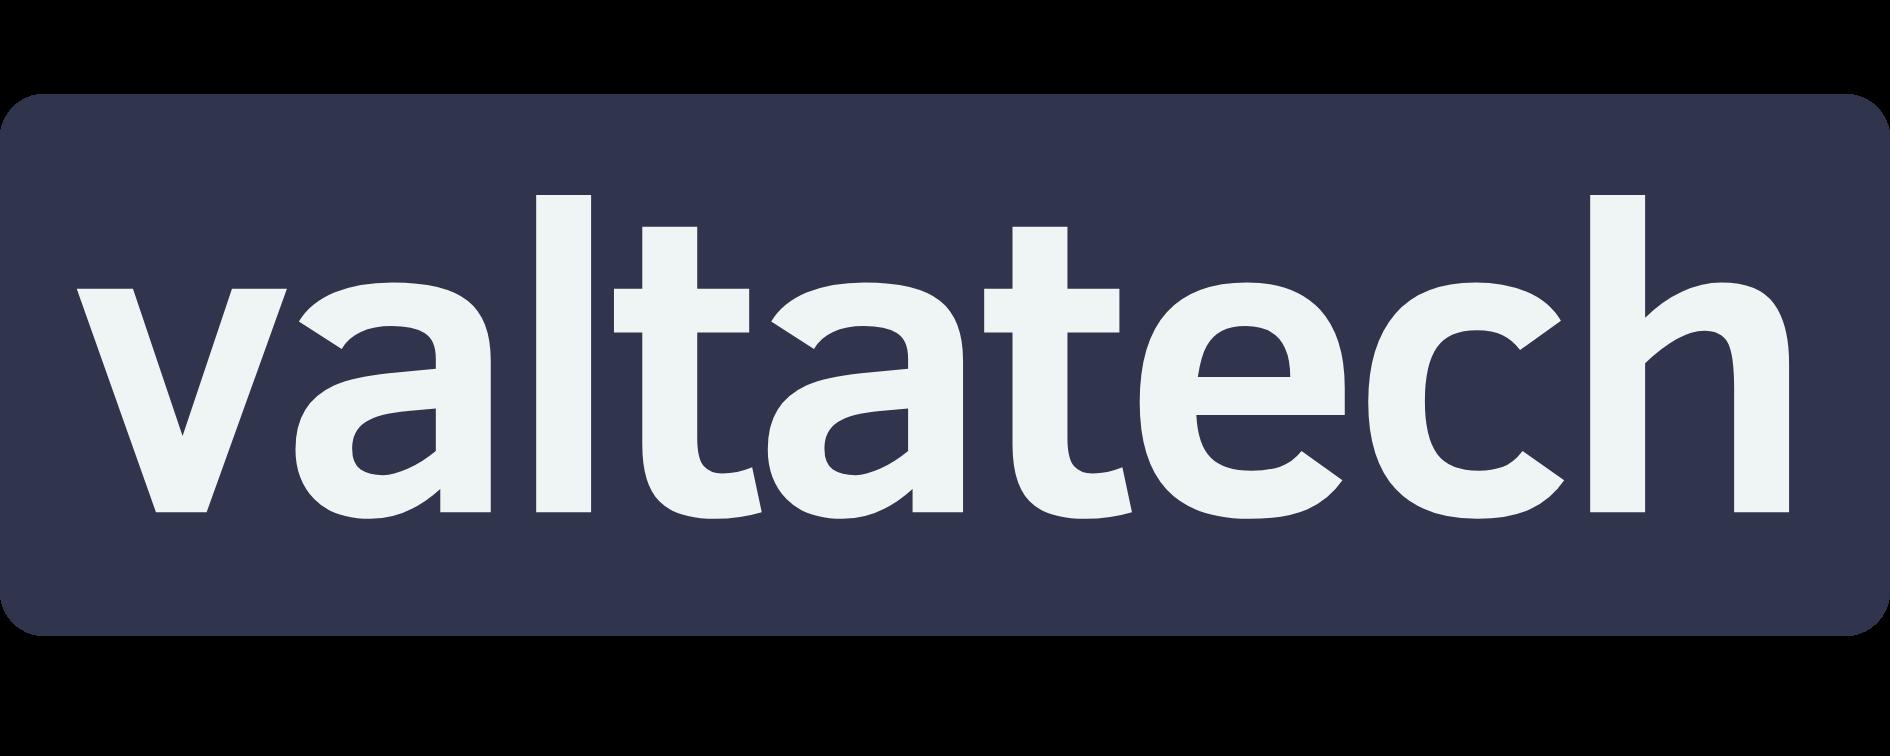 valtatech logo